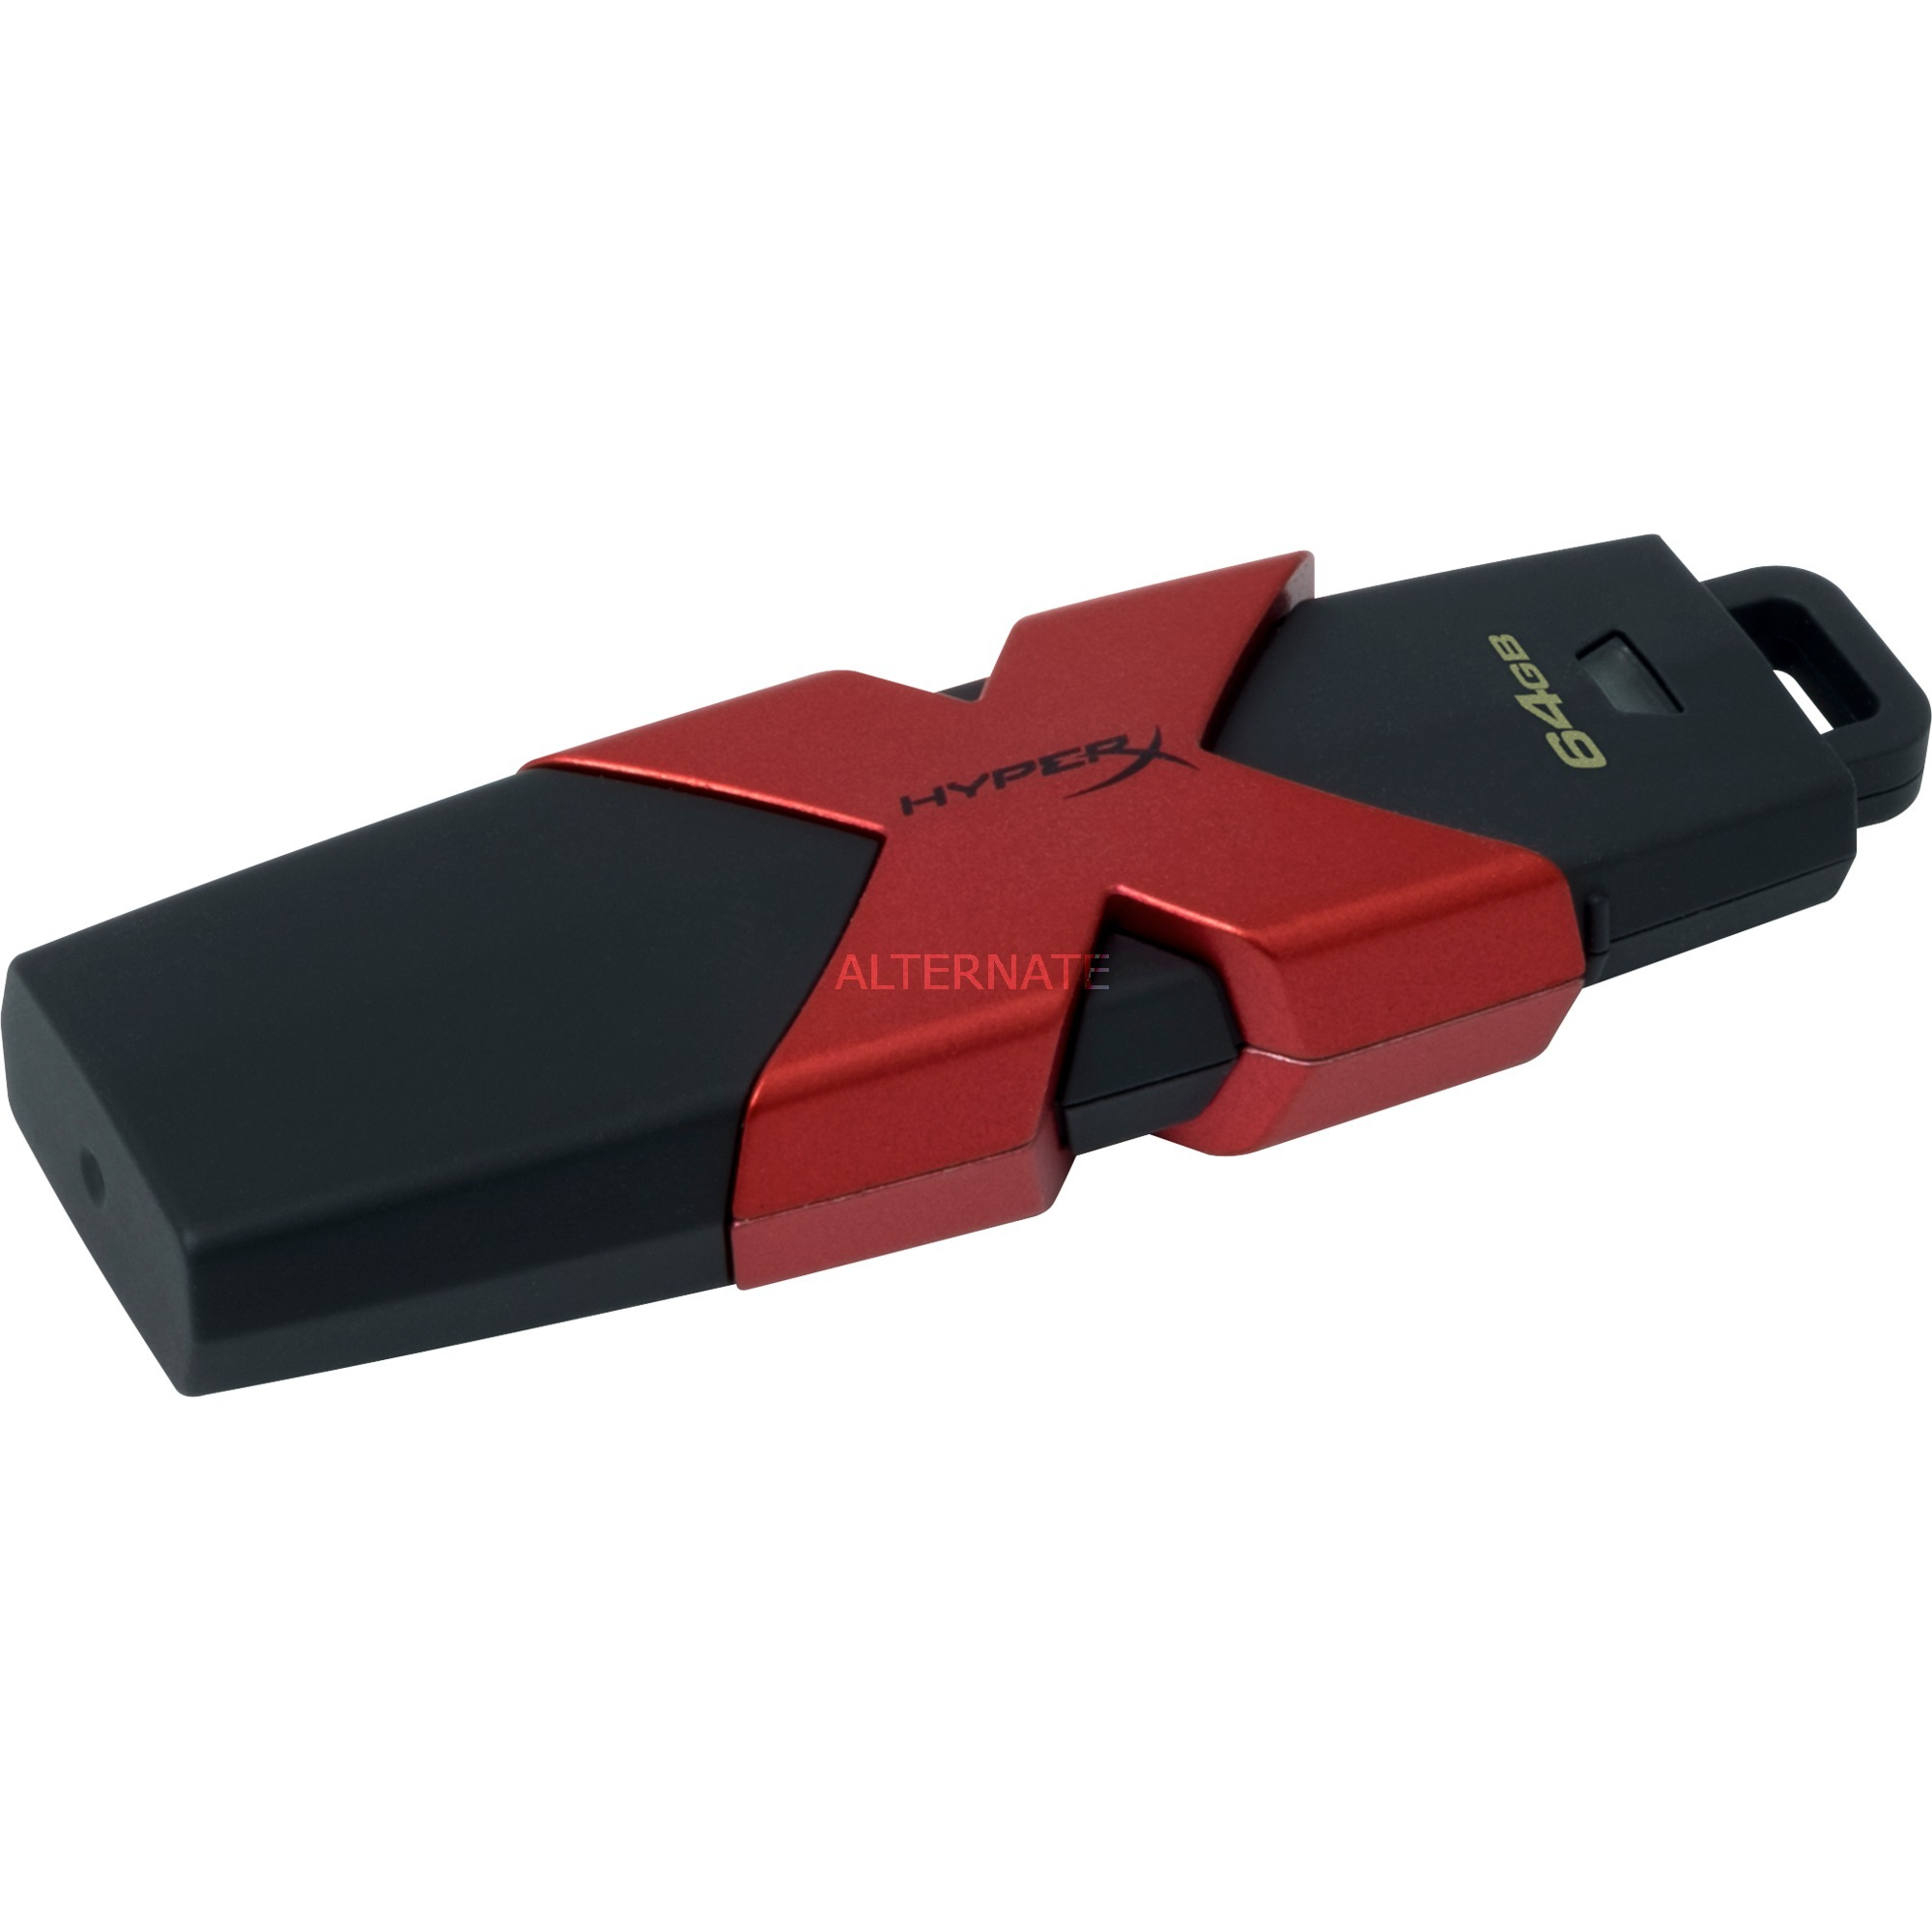 64GB 64GB USB 3.0 (3.1 Gen 1) Conector USB Tipo A Negro, Rojo unidad flash USB, Lápiz USB